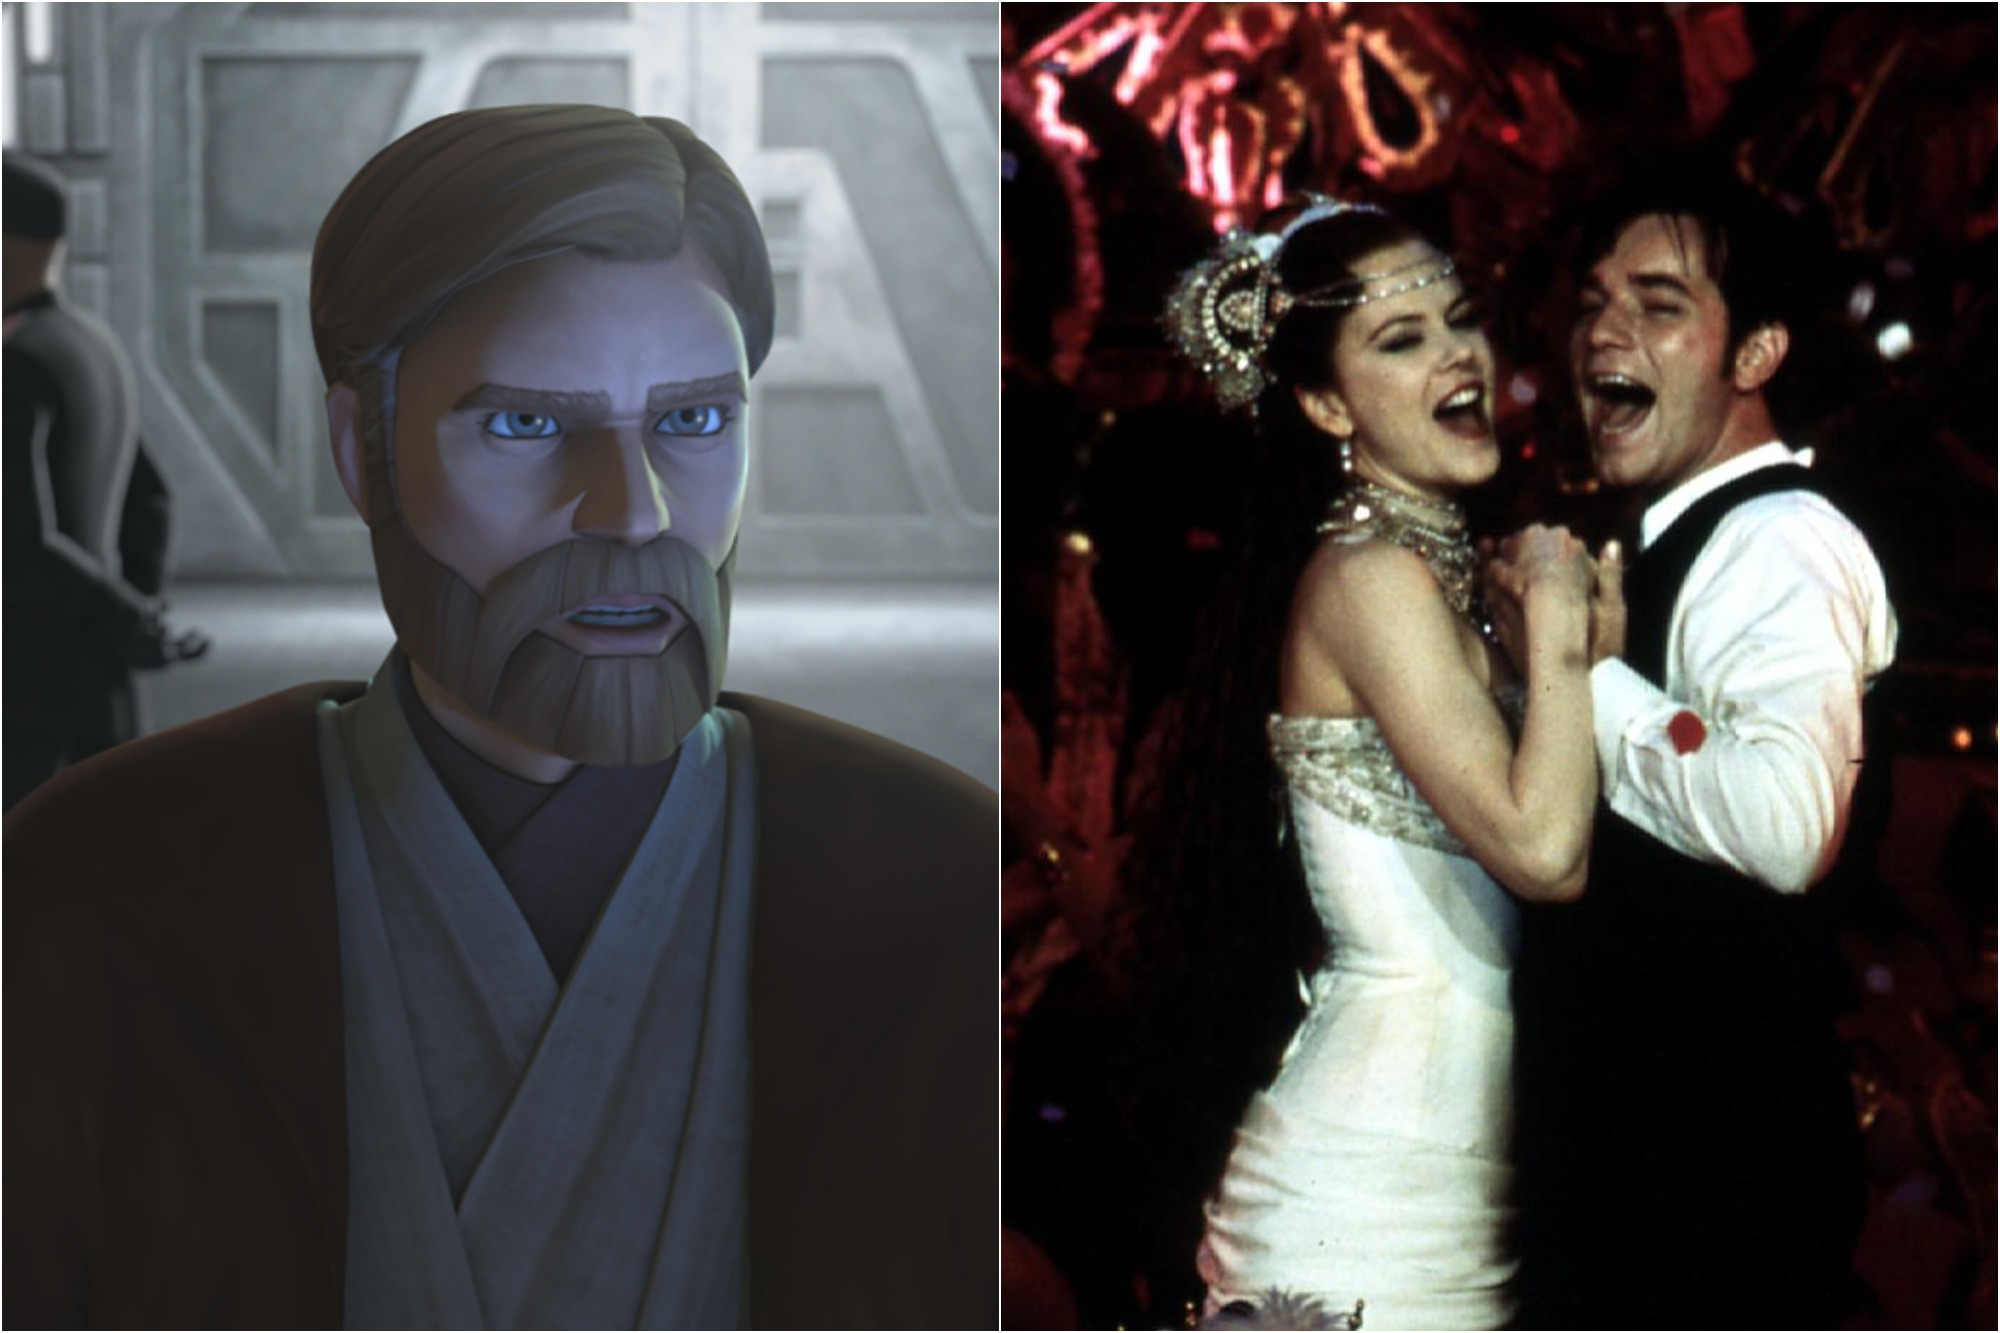 Obi-Wan Kenobi in Season 7 of 'Star Wars: The Clone Wars' / Nicole Kidman as Satine and Ewan McGregor as Christian in 'Moulin Rouge'